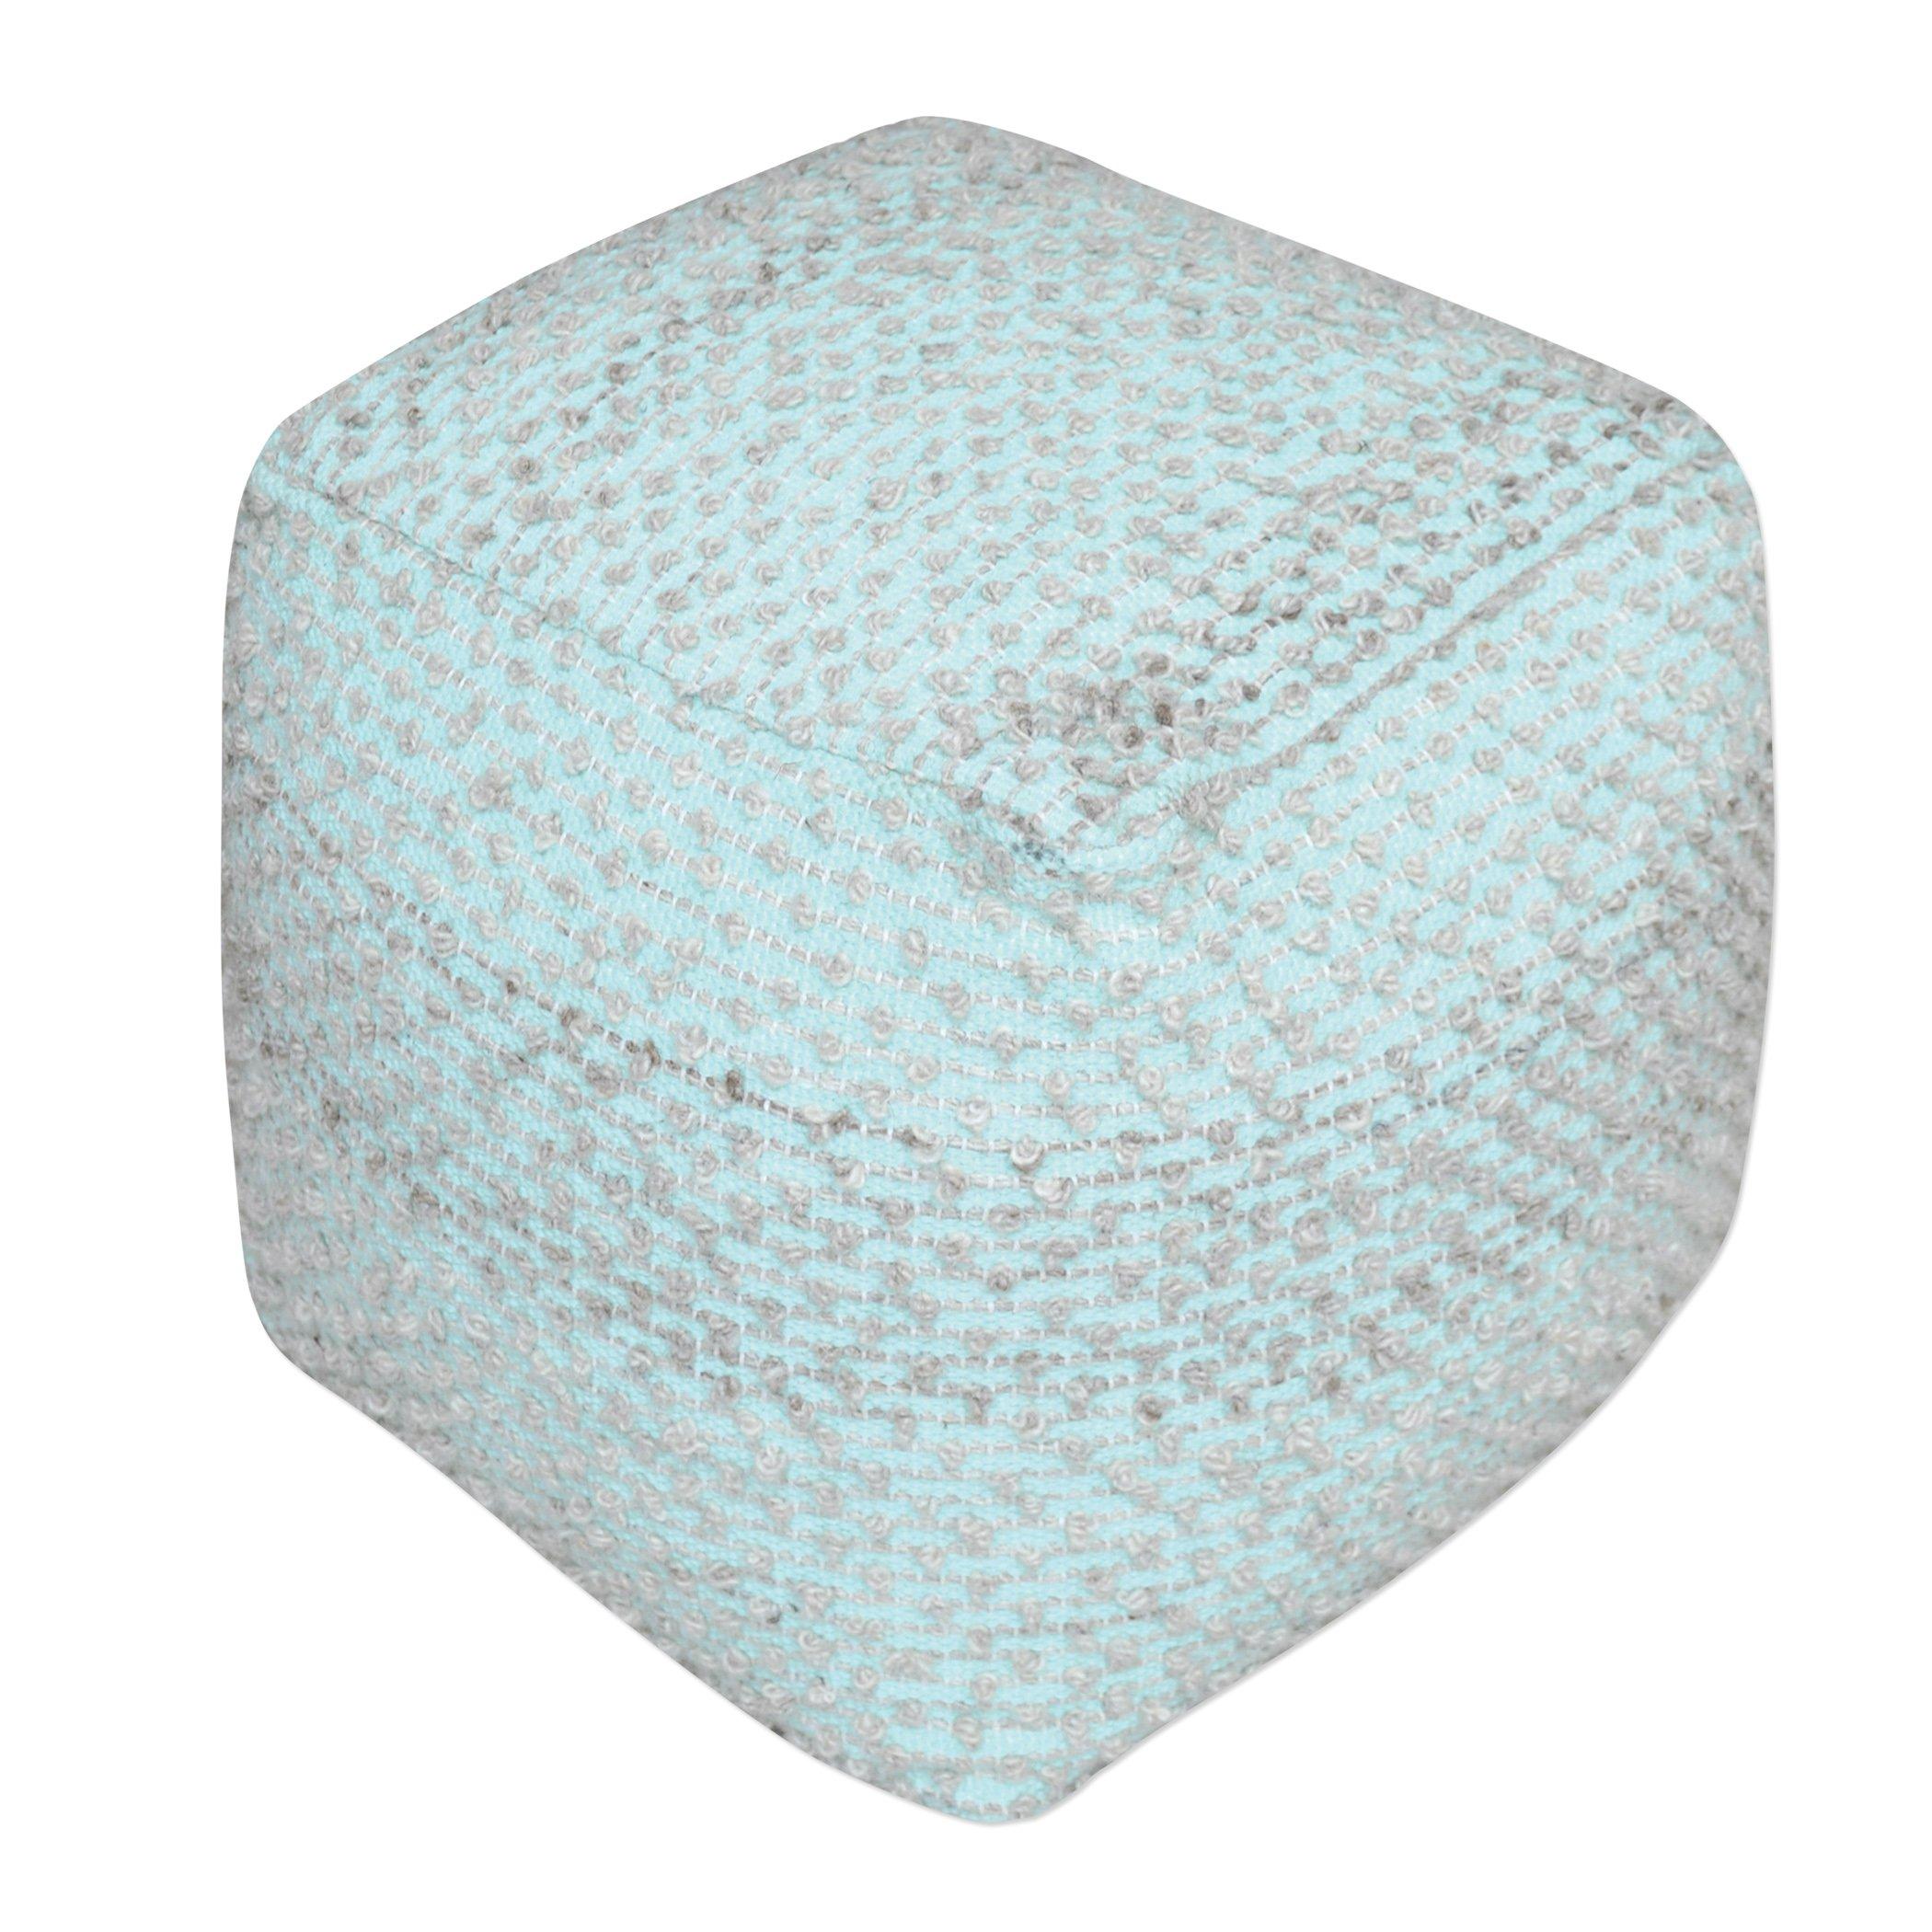 Aqua Turquoise Cotton Cube Pouf | Plush Ottoman Fabric Blue Seat Square Wool